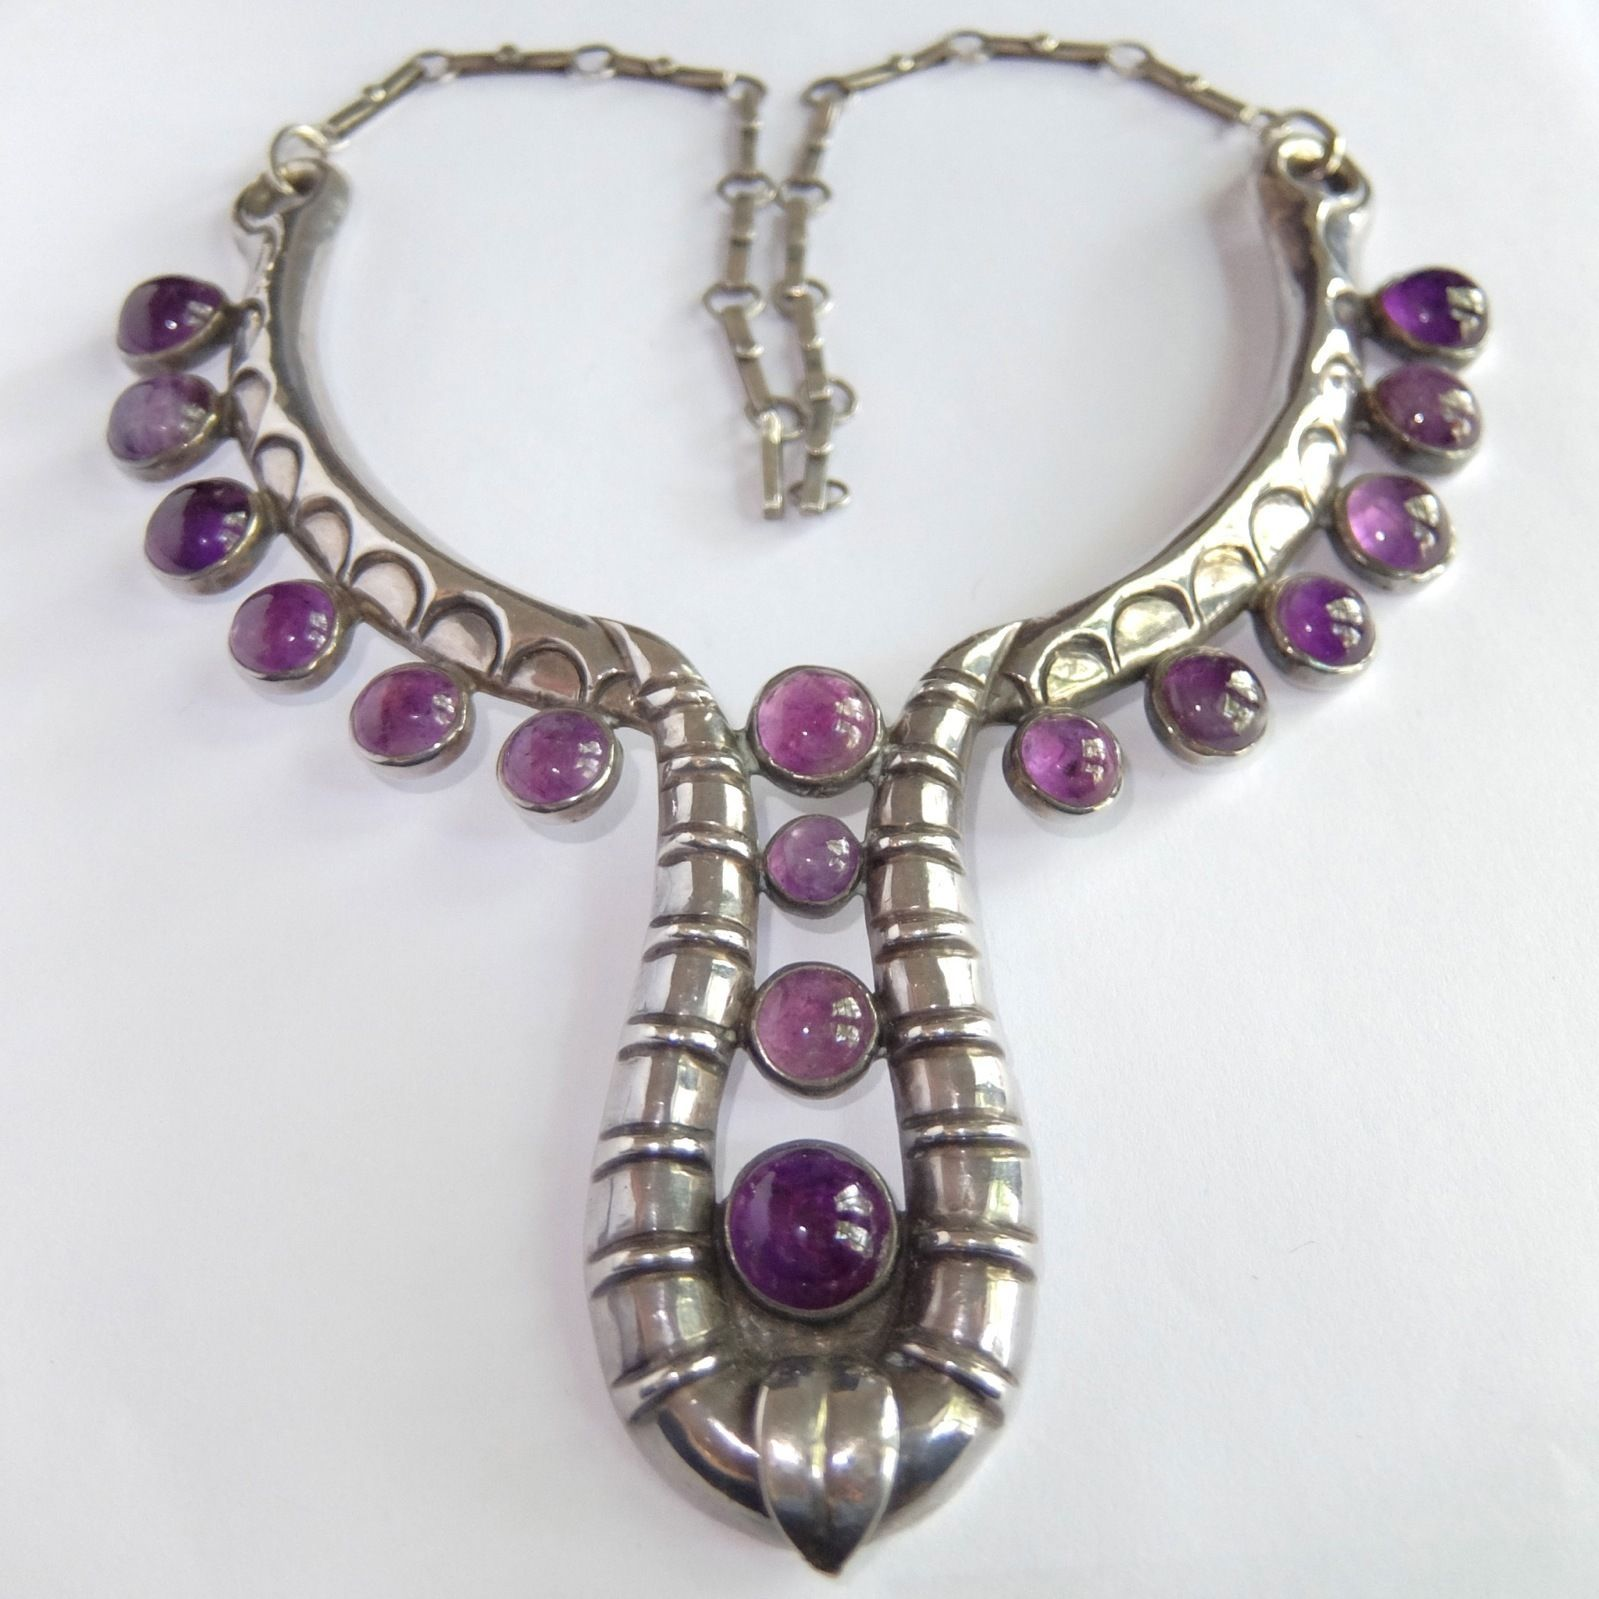 Rare Large Unusual Vintage Art Deco Mexico Sterling Silver Amethyst Necklace Vintage Silver Jewelry Mexican Silver Jewelry Jewelry Drawing